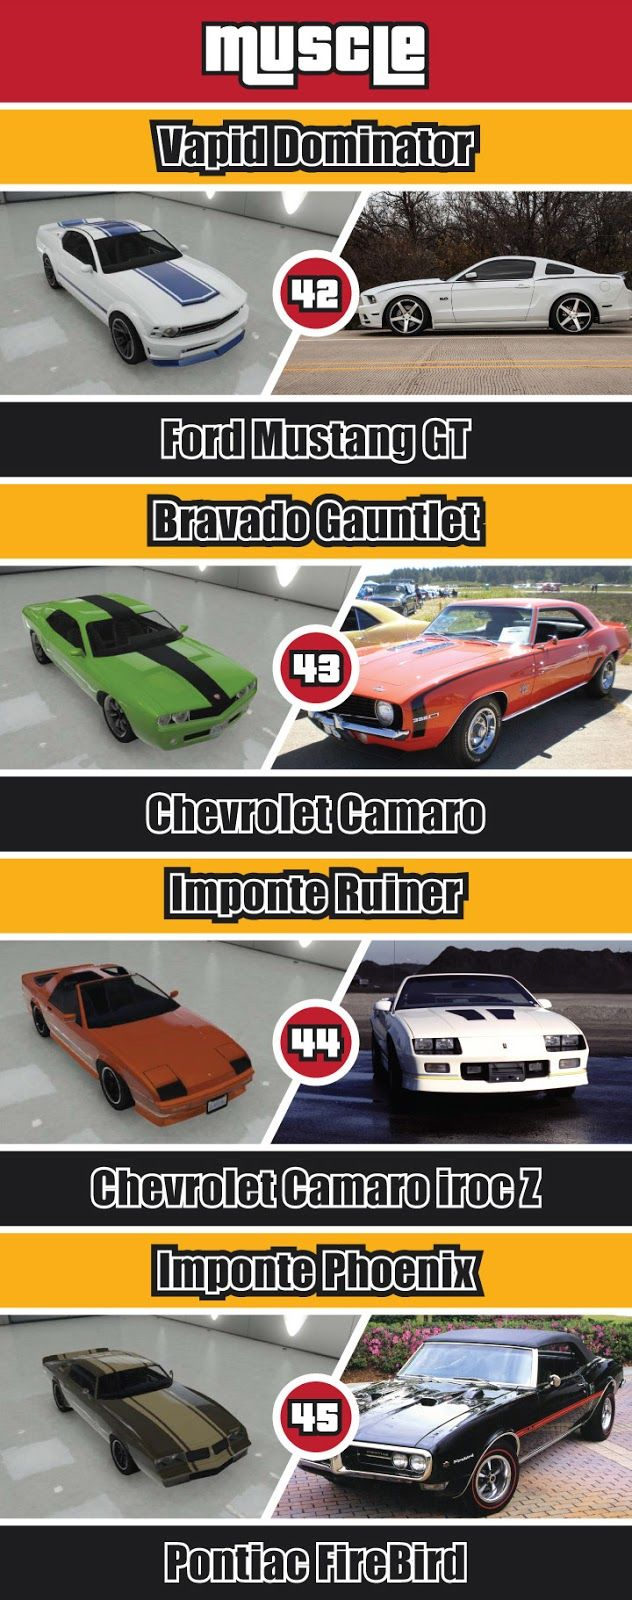 44e51e5ae3b93ba4c3235024611b5076 - How To Get Real Life Cars On Gta 5 Ps4